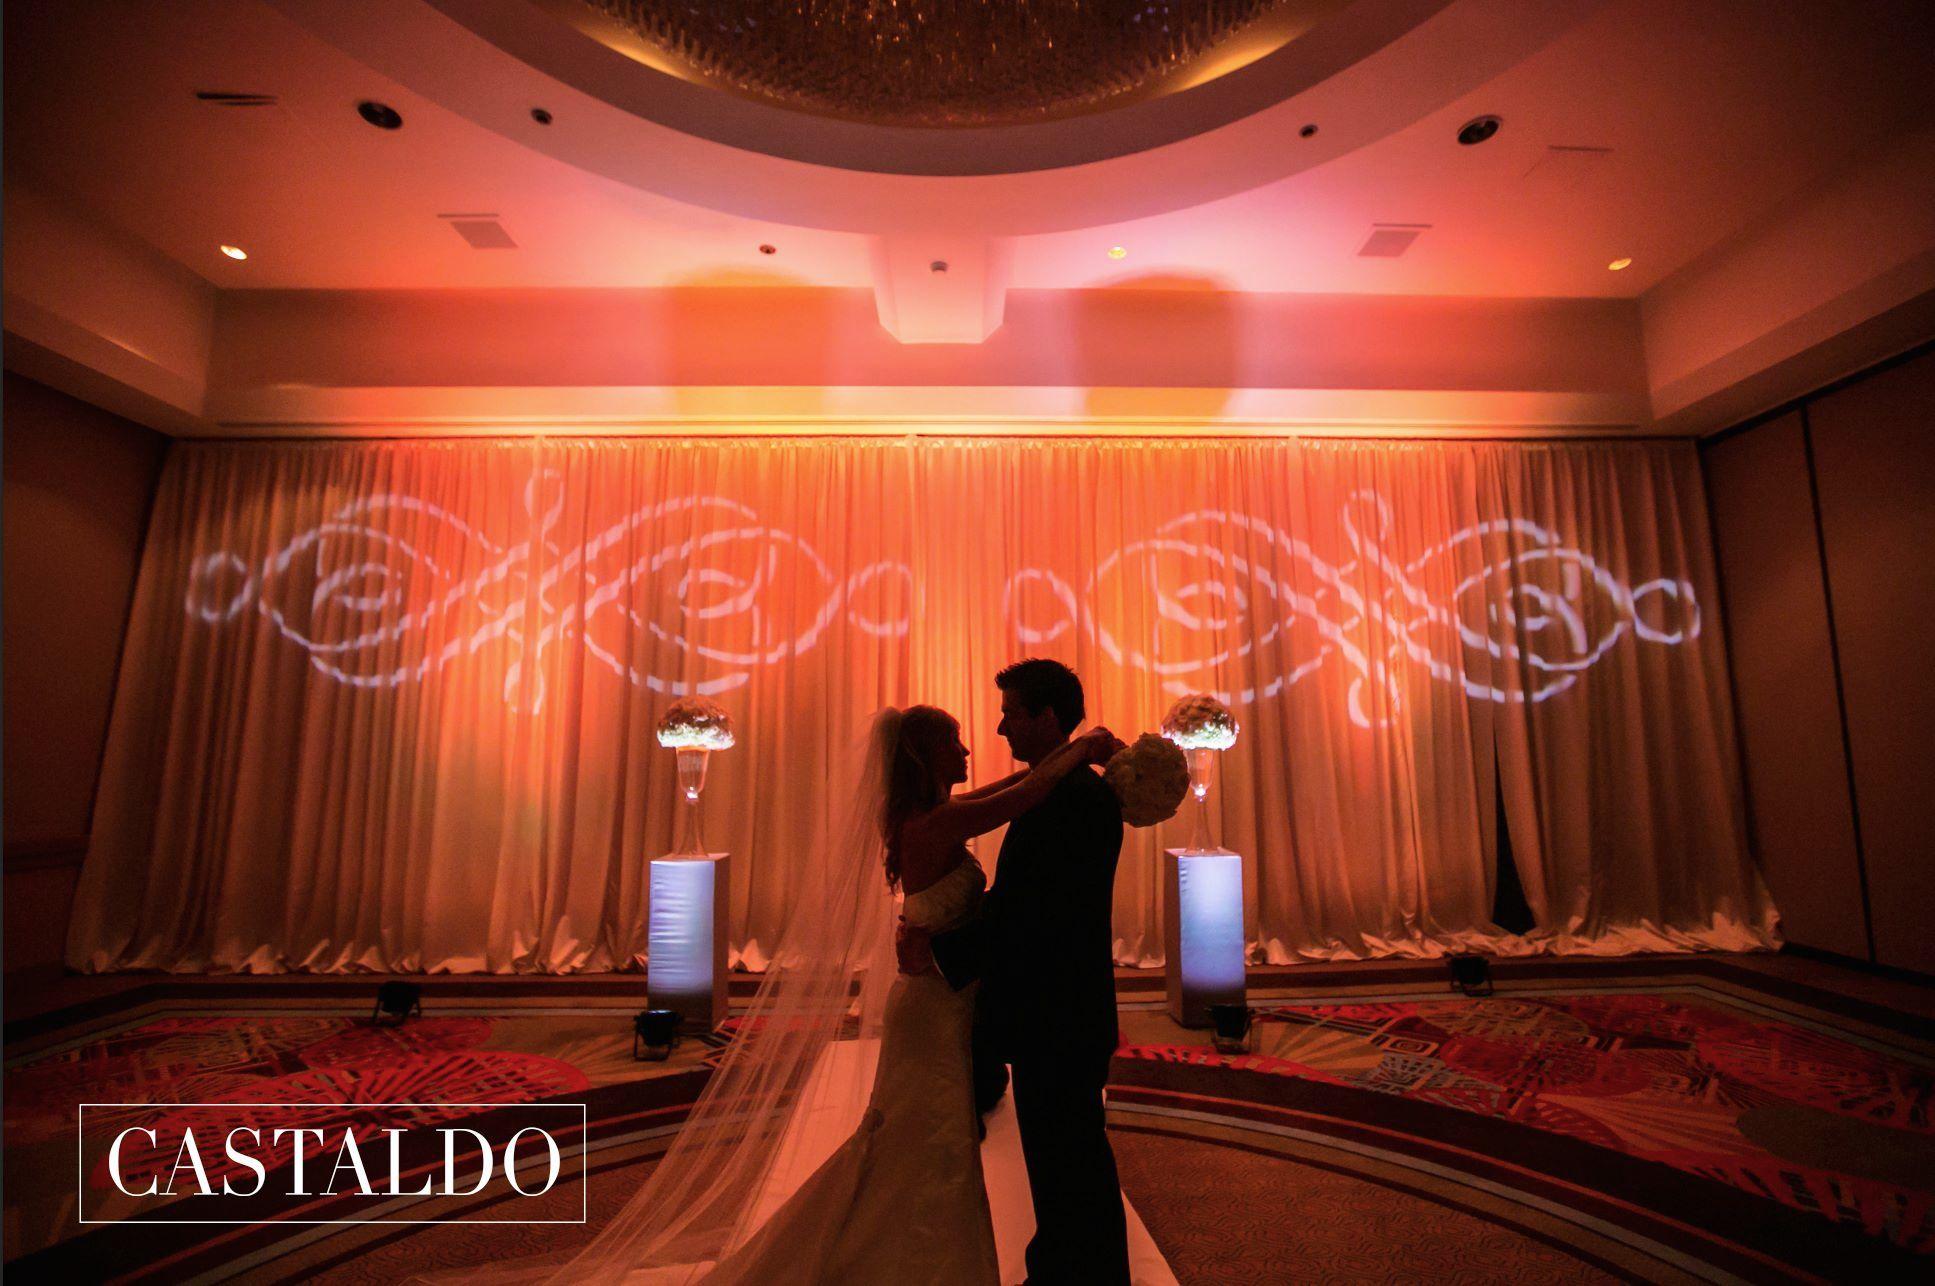 Hyatt-Regency-orlando-wedding-castaldo-studio-Soundwave-DJ-LED-Lighting-Swag-decor